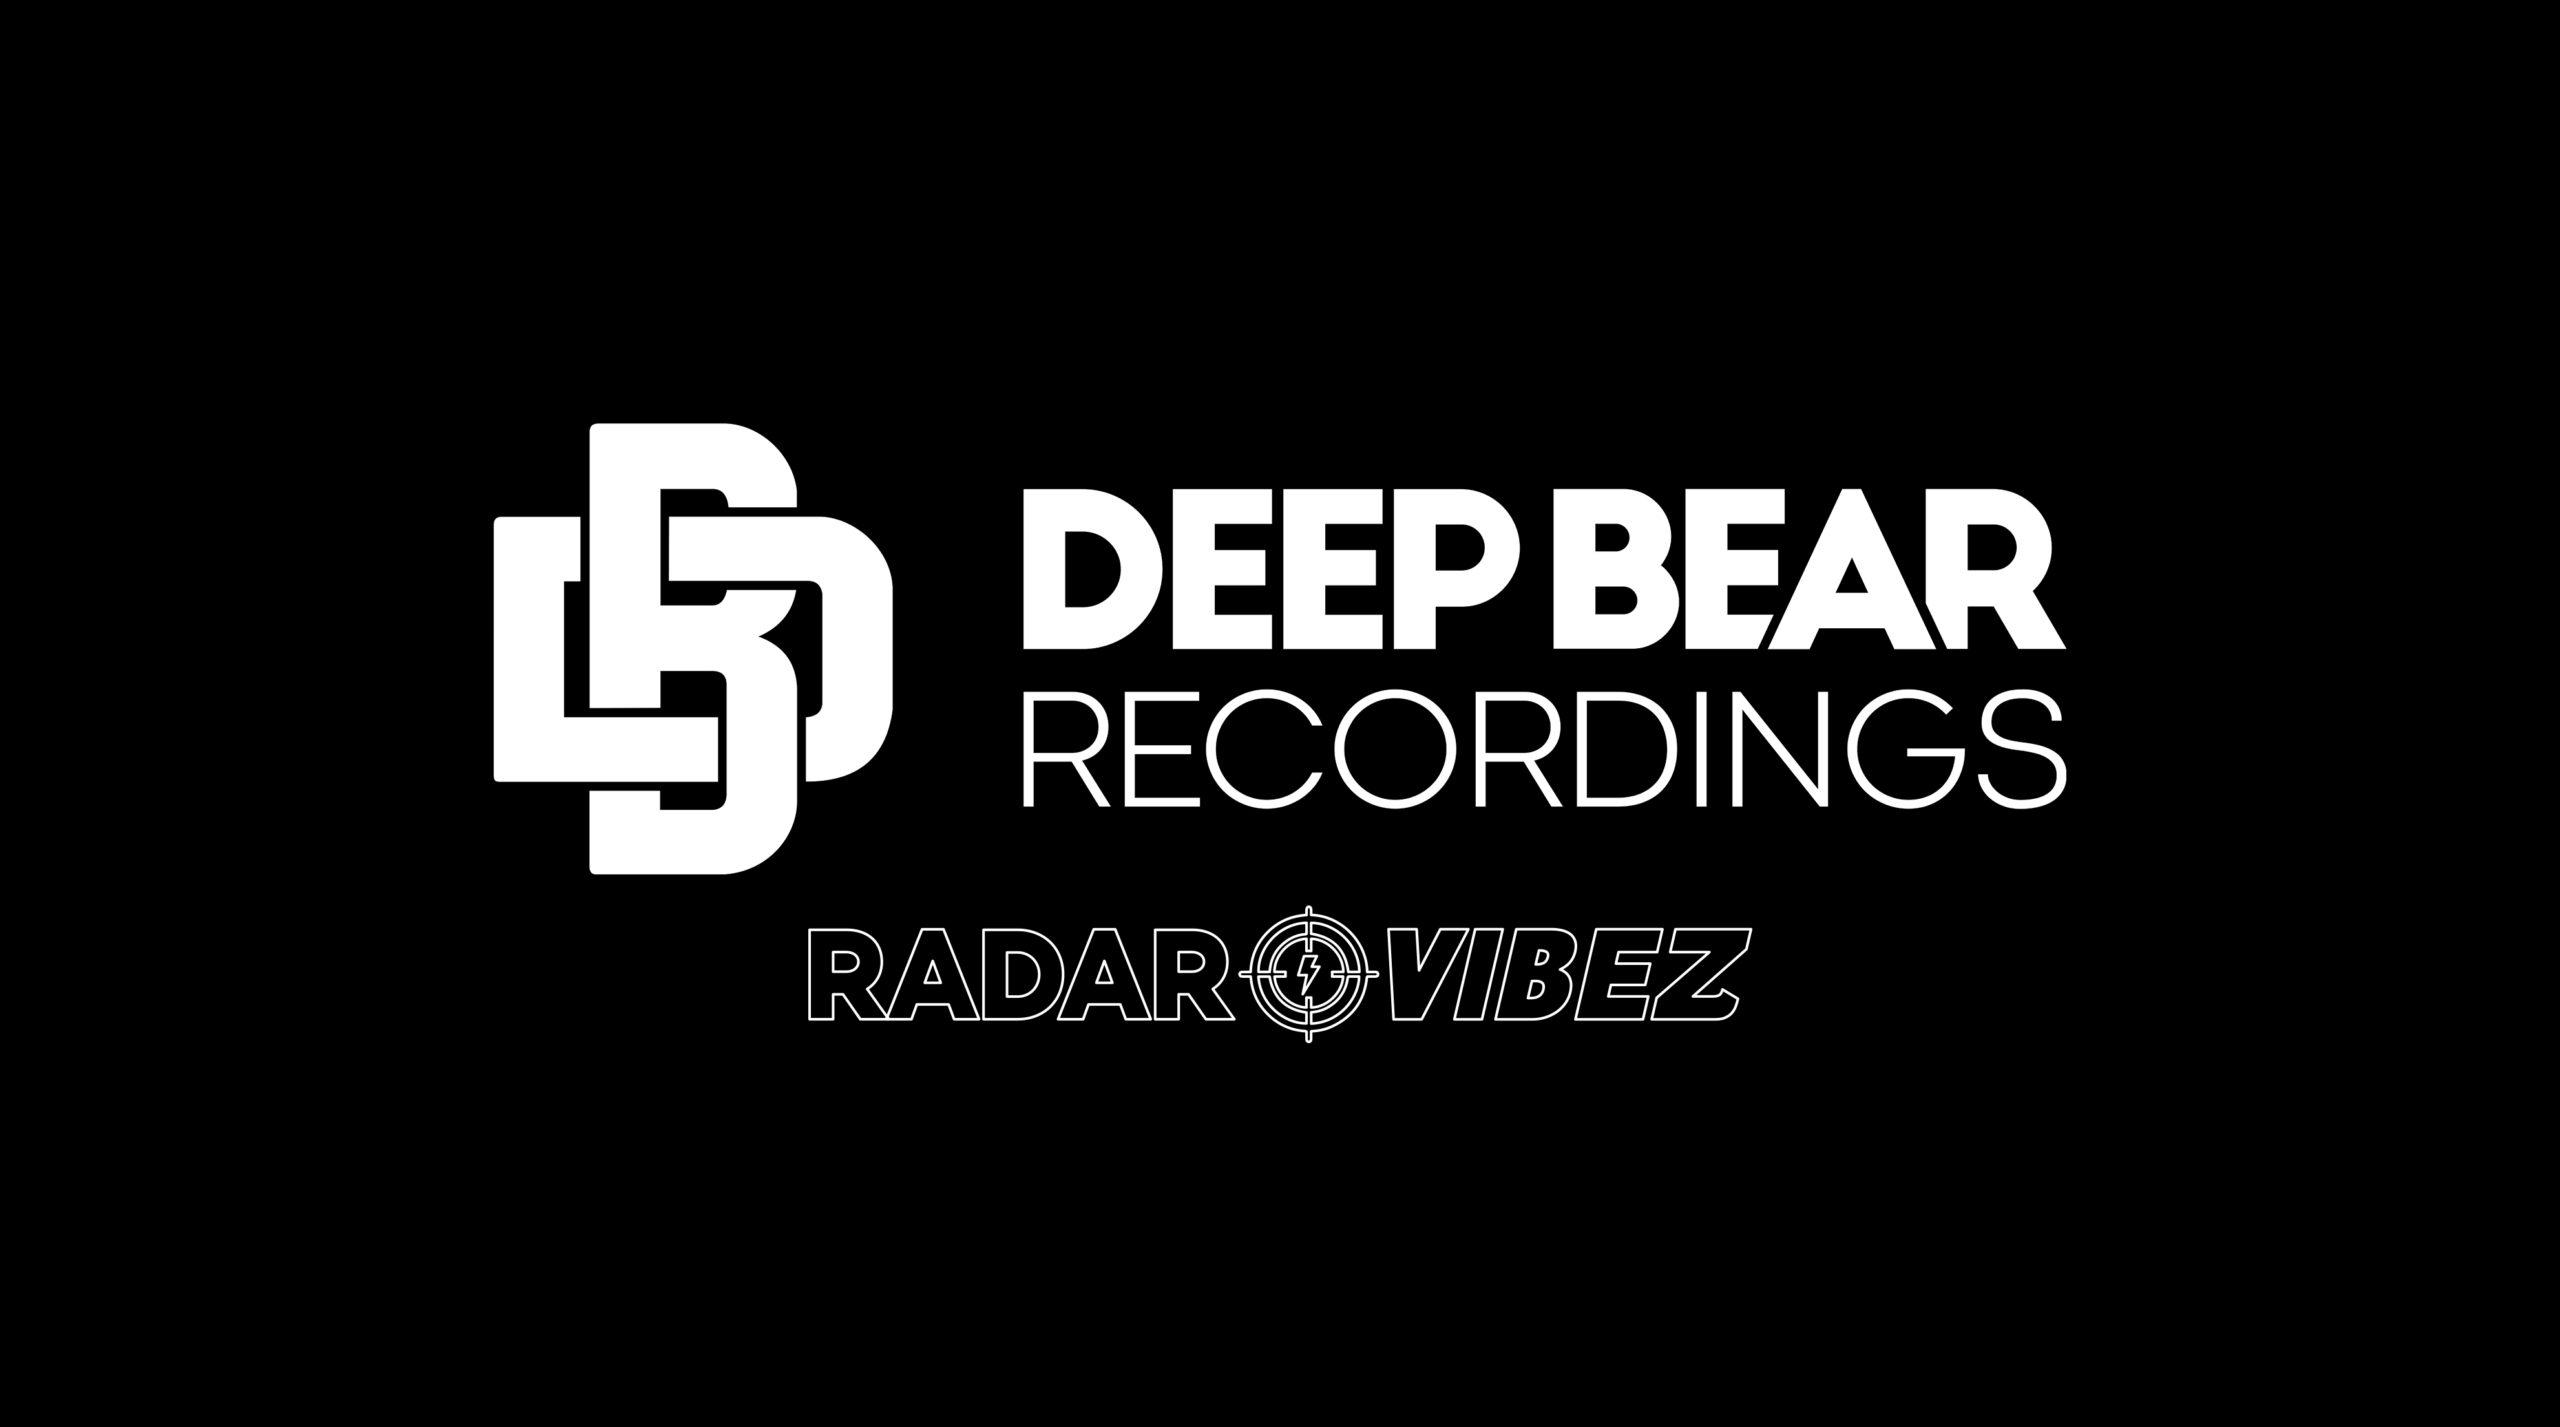 radar vibez gravadora entrevista deep bear scaled